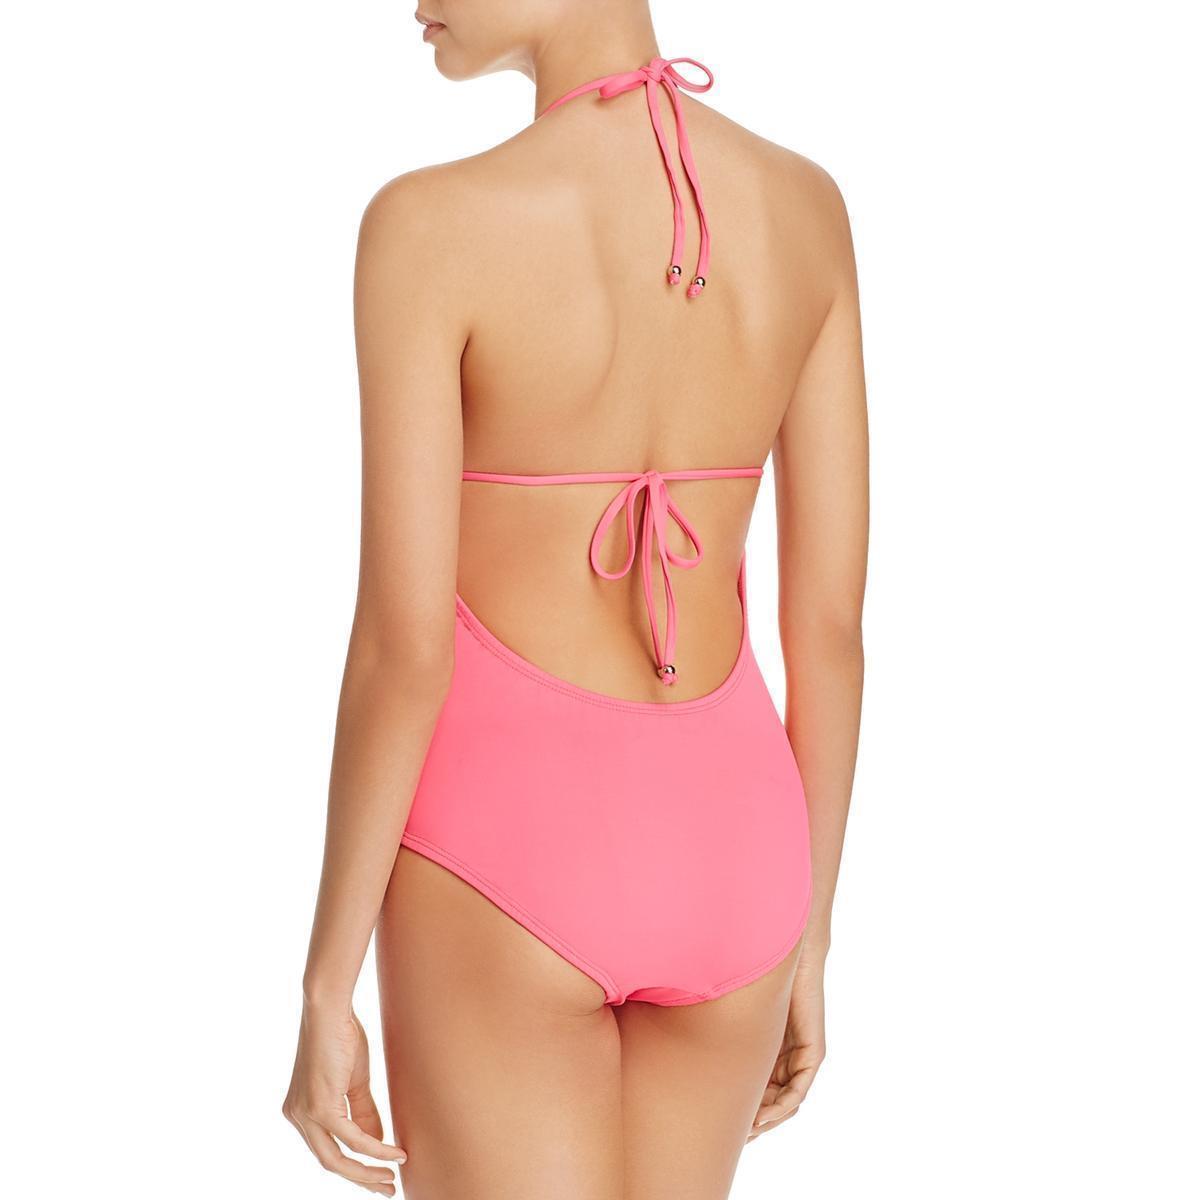 7499173f7f8971 Shoshanna Fuchsia Lattice Ruffle Halter One Piece Swimsuit 4 for ...